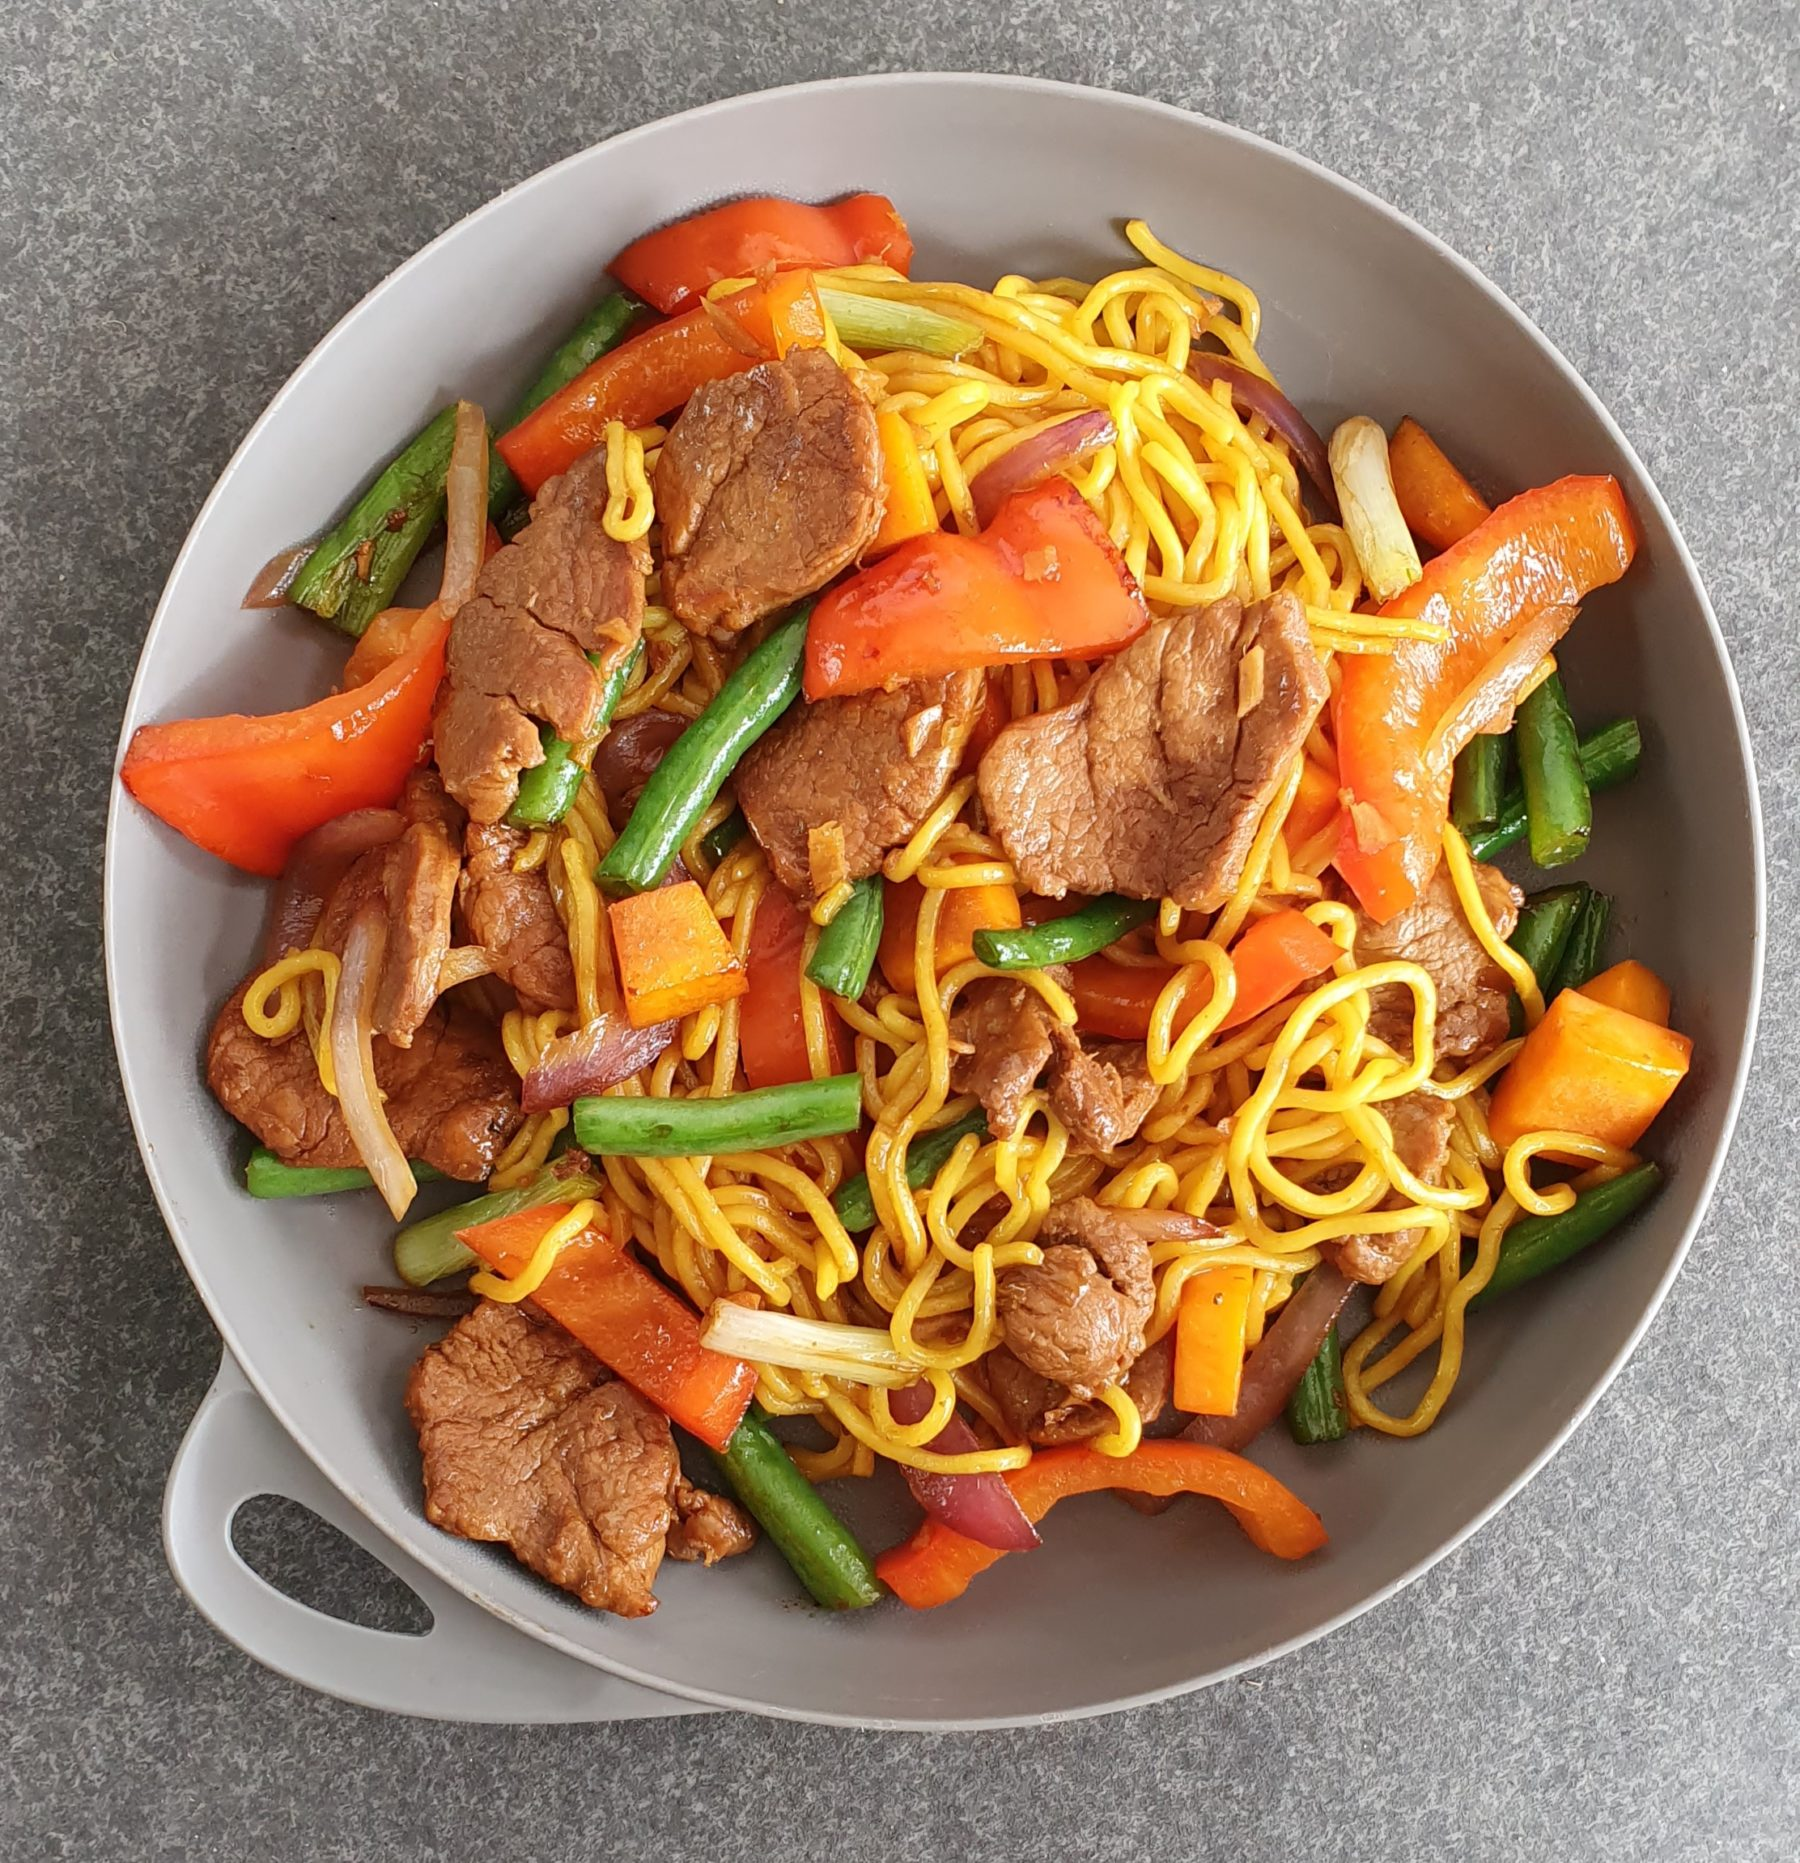 Chilli Ginger Pork Noodles Photo @Kylie Day